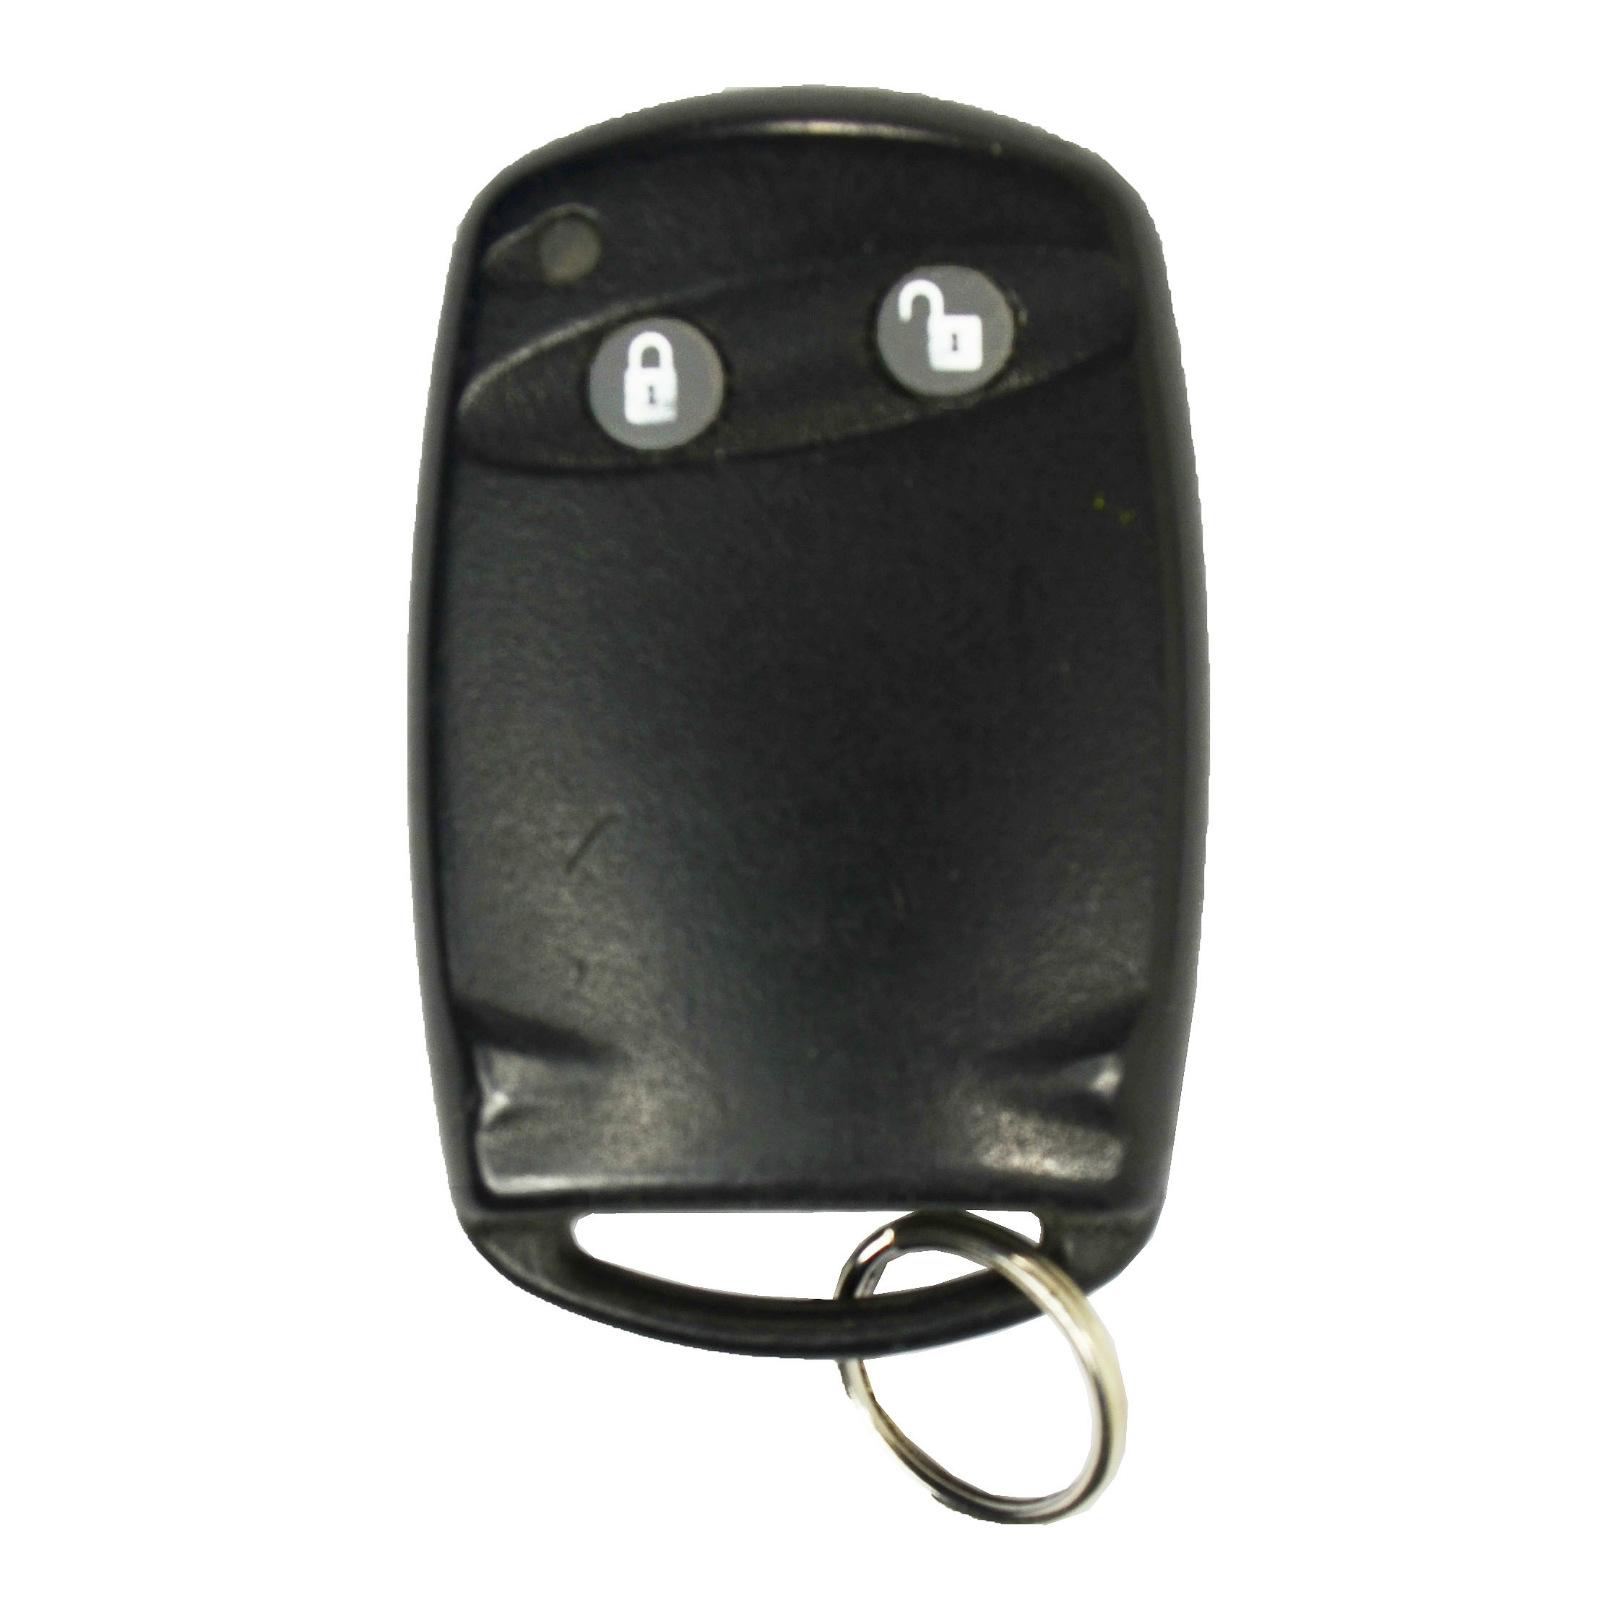 Elm Home Alarm Security System Remote B4z 636a Keyfob